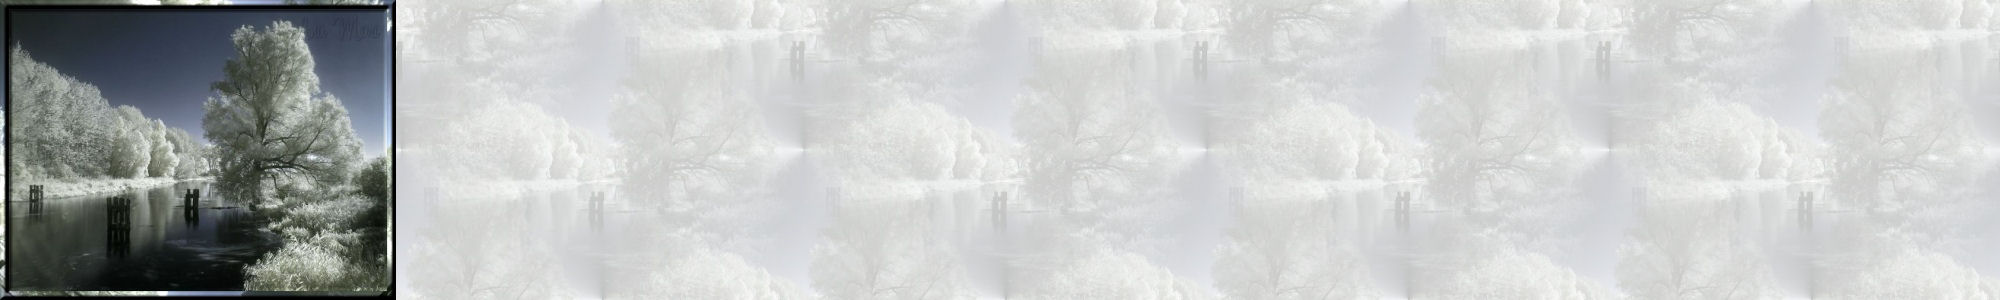 Fondo IM nieve_rio_004.imf